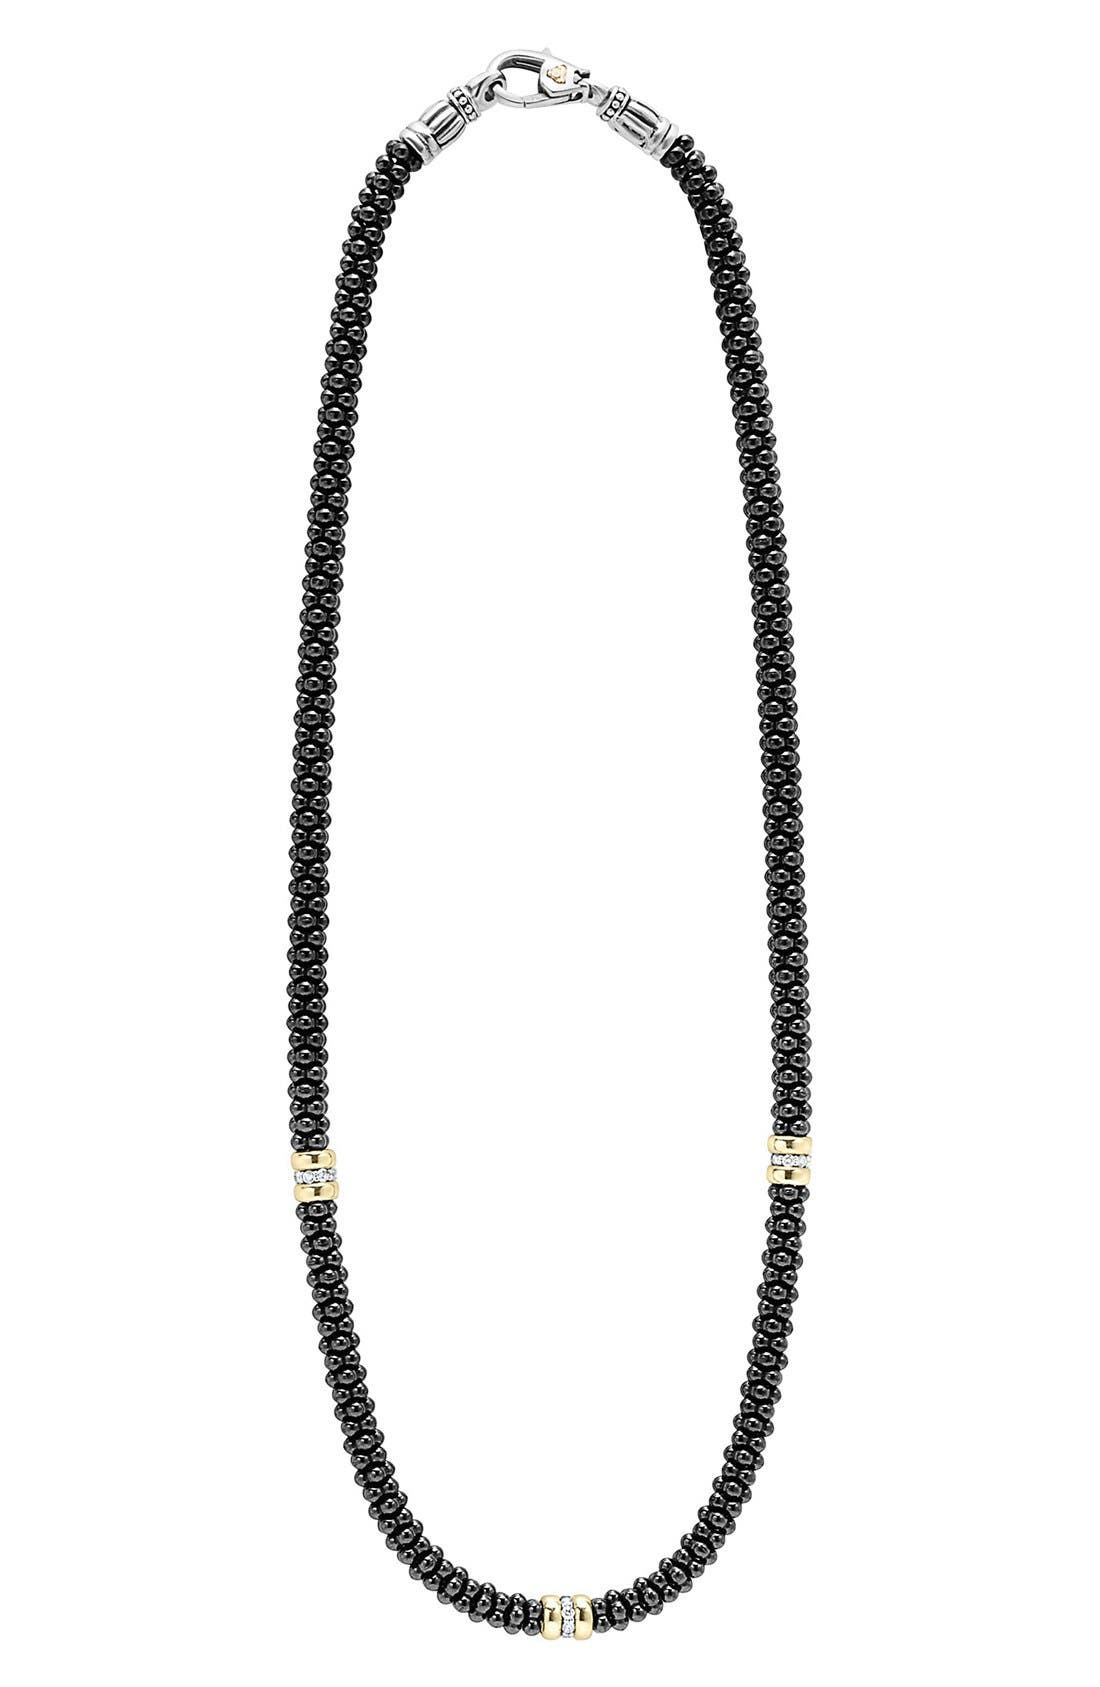 'Black Caviar' Station Necklace,                             Main thumbnail 1, color,                             BLACK CAVIAR/ GOLD